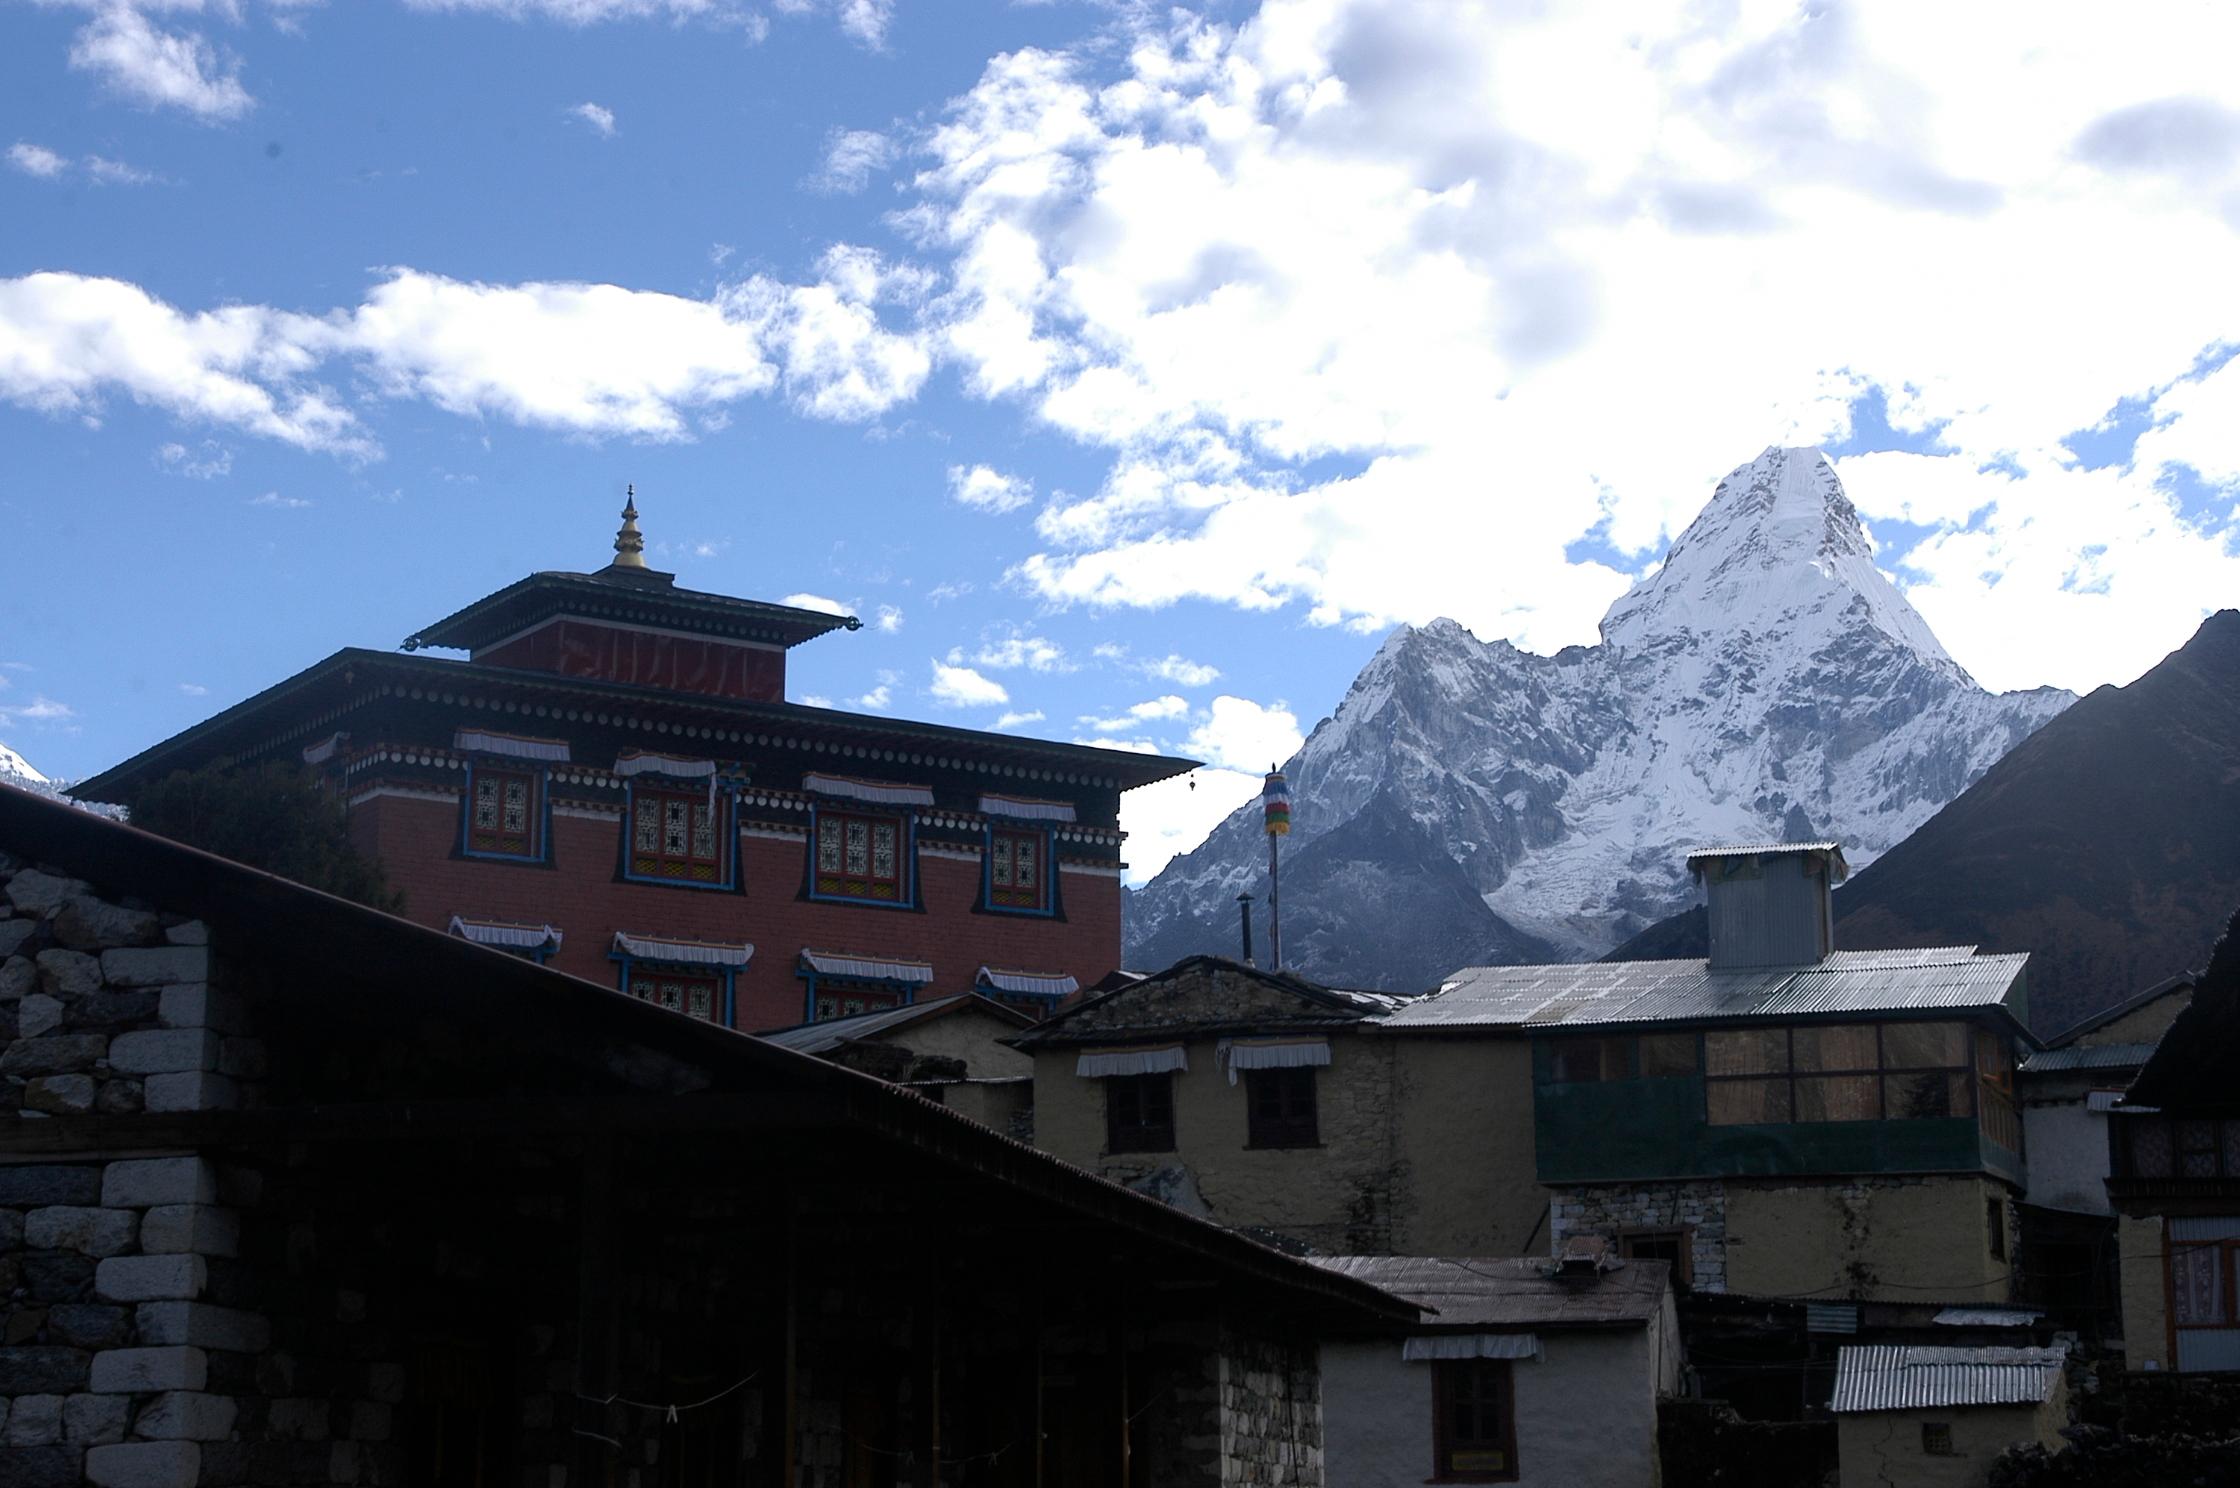 EverestGokyoLake_Village2_AANepal.JPG